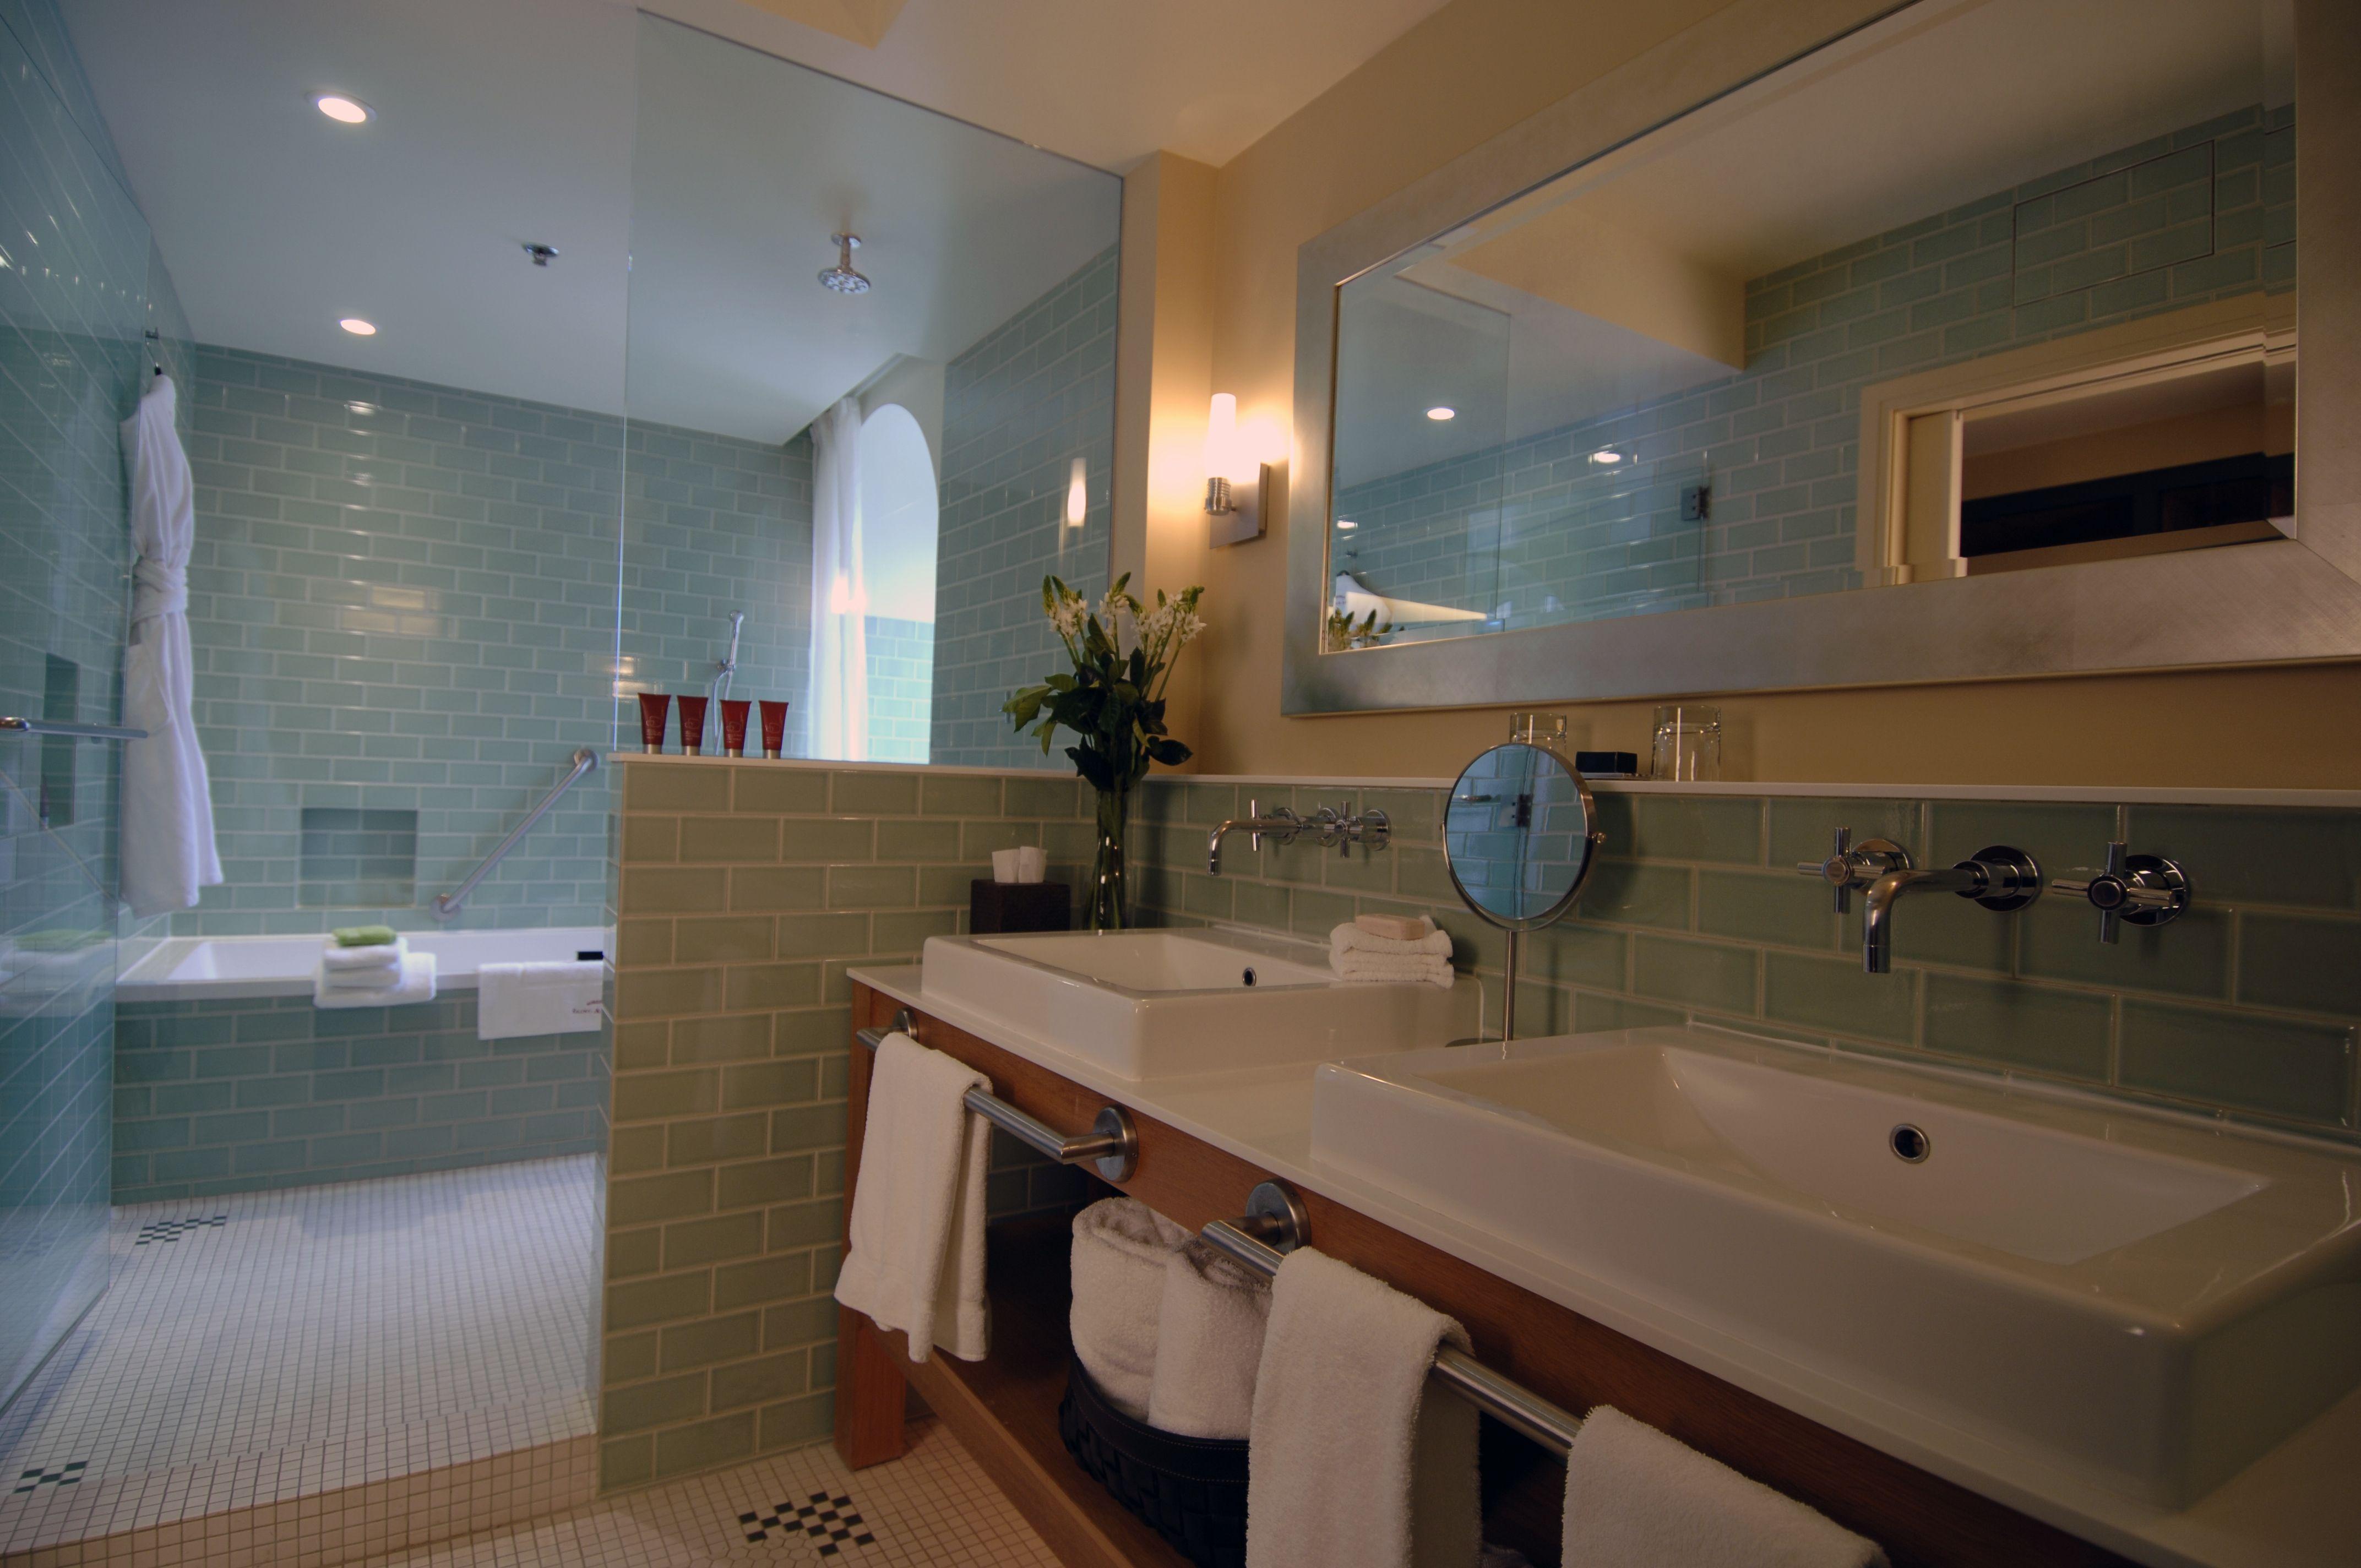 Salle De Bain Quebec Qc ~ beautiful bathroom of a auberge saint antoine s room magnifique